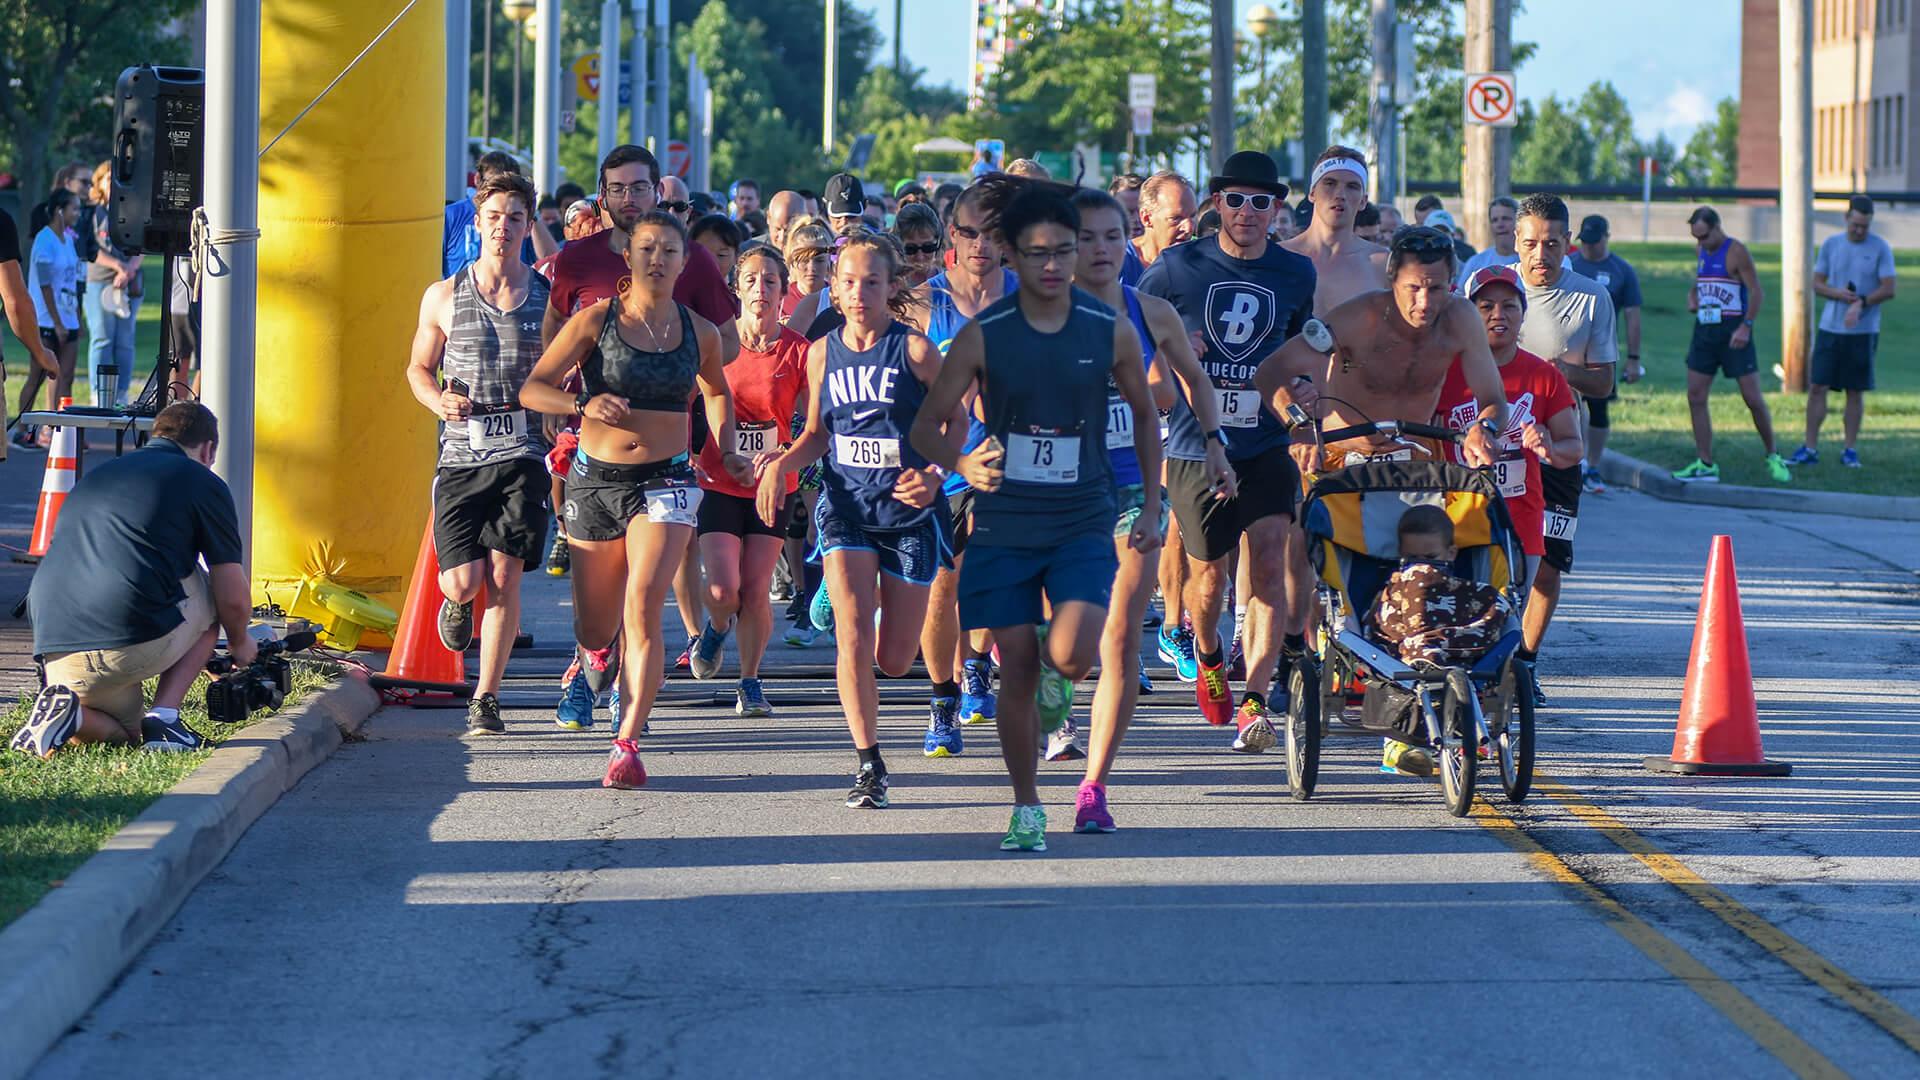 Fitness-focused Street Beat 5K returns to World Championship festivities